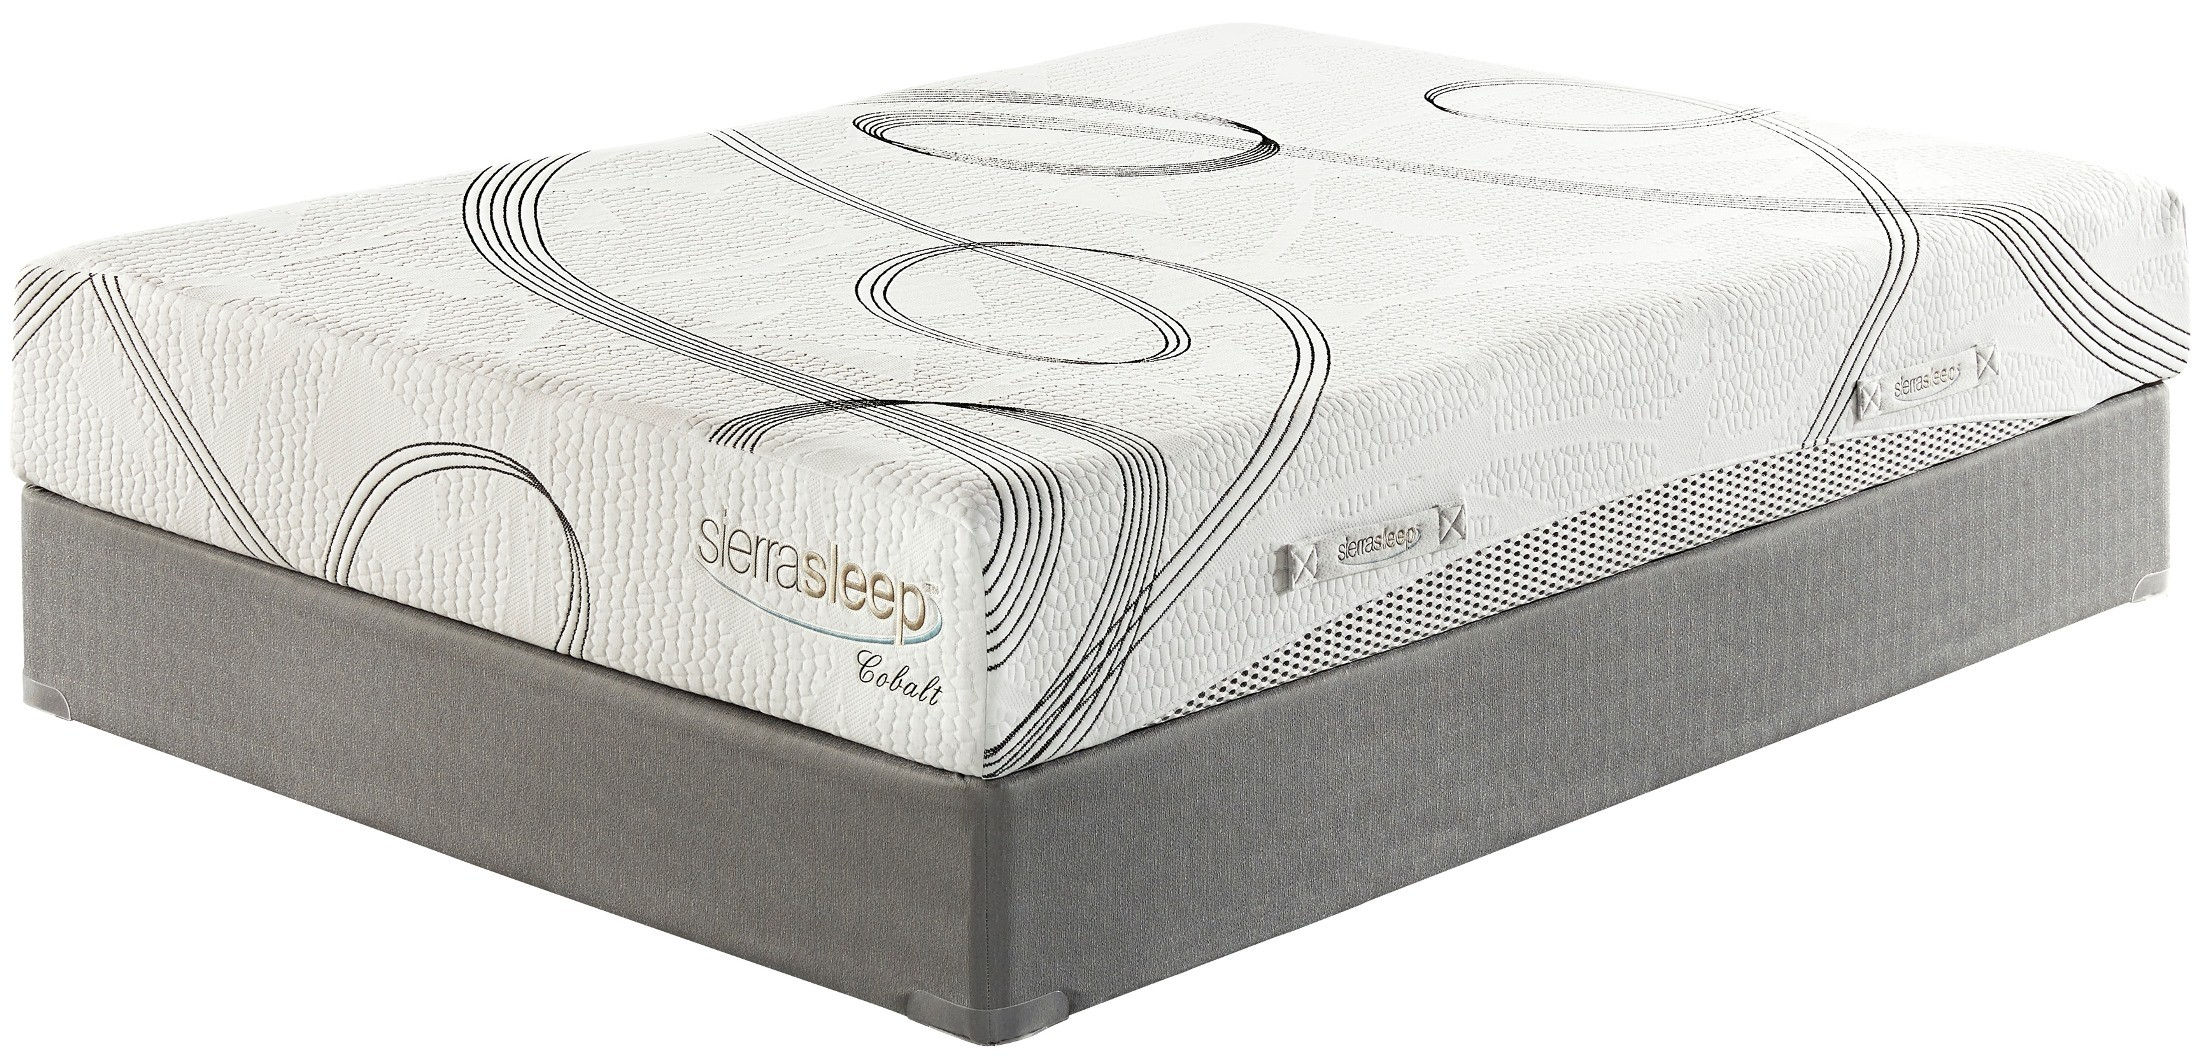 10 Series Queen Size Memory Foam Mattress M99131 Ashley Furniture